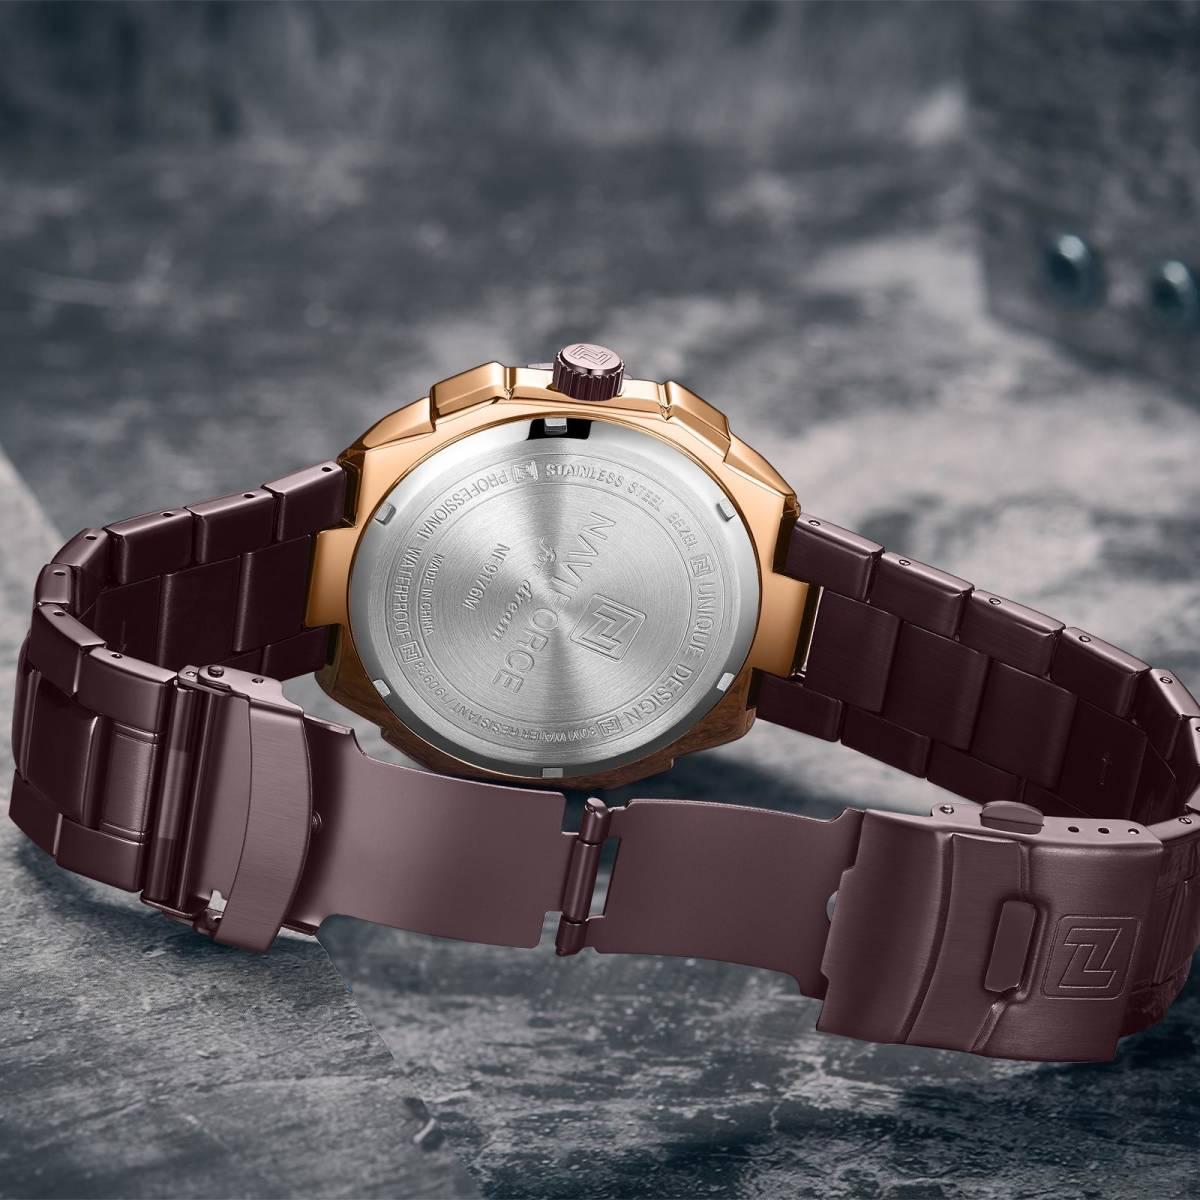 Naviforce ファッション男性高級ブランドのスポーツクォーツ腕時計男性ビッグダイヤル時計防水時計レロジオ masculino_画像3